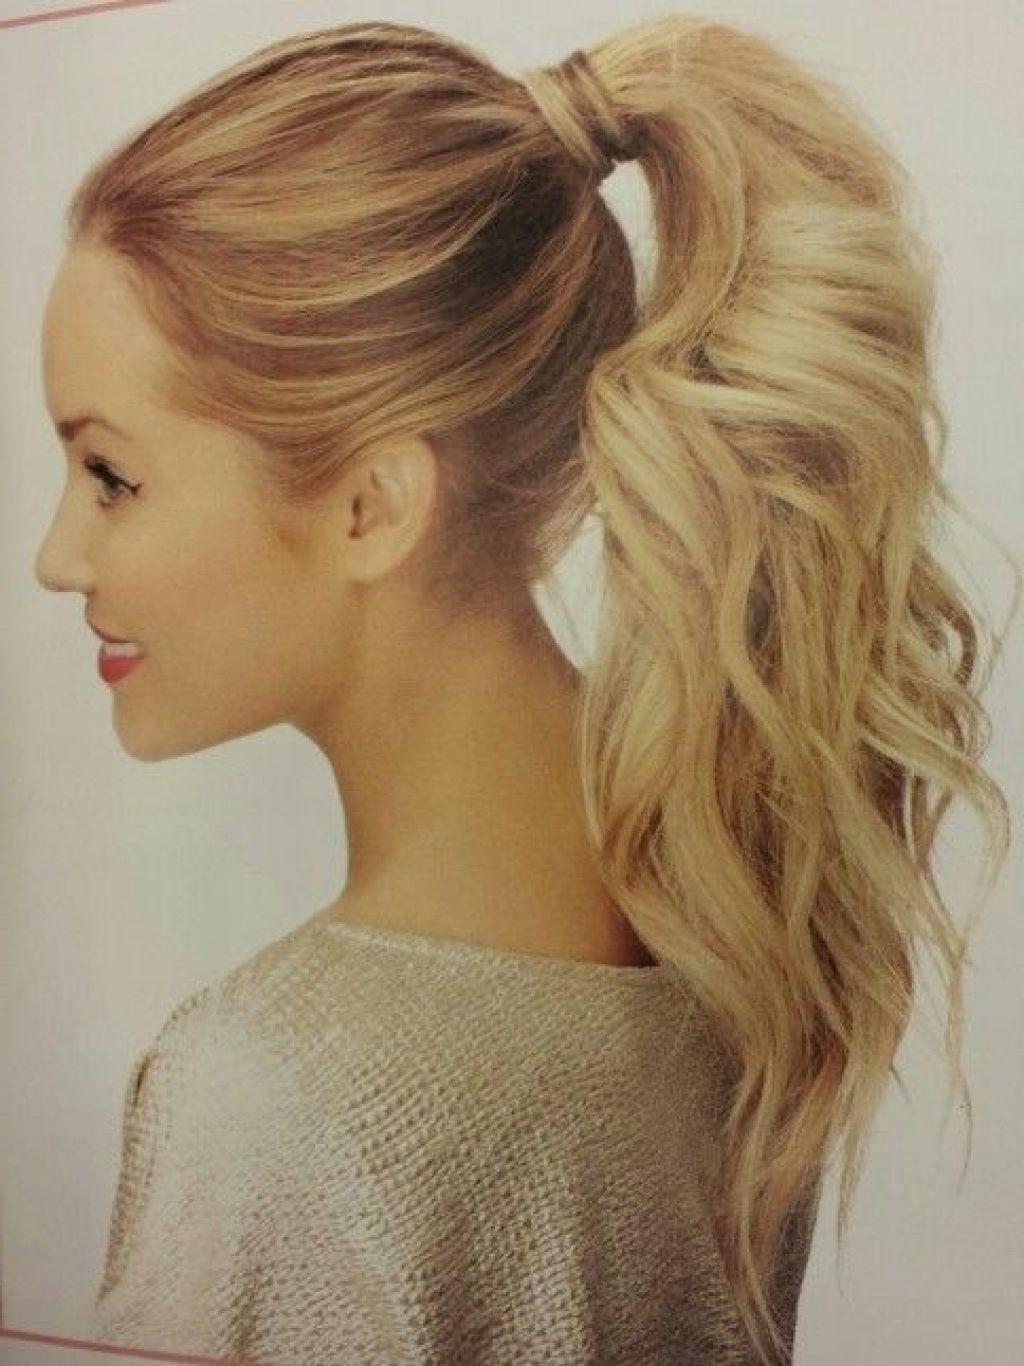 31+ Classy & Stunning Braided Hairstyles for Women - Sensod